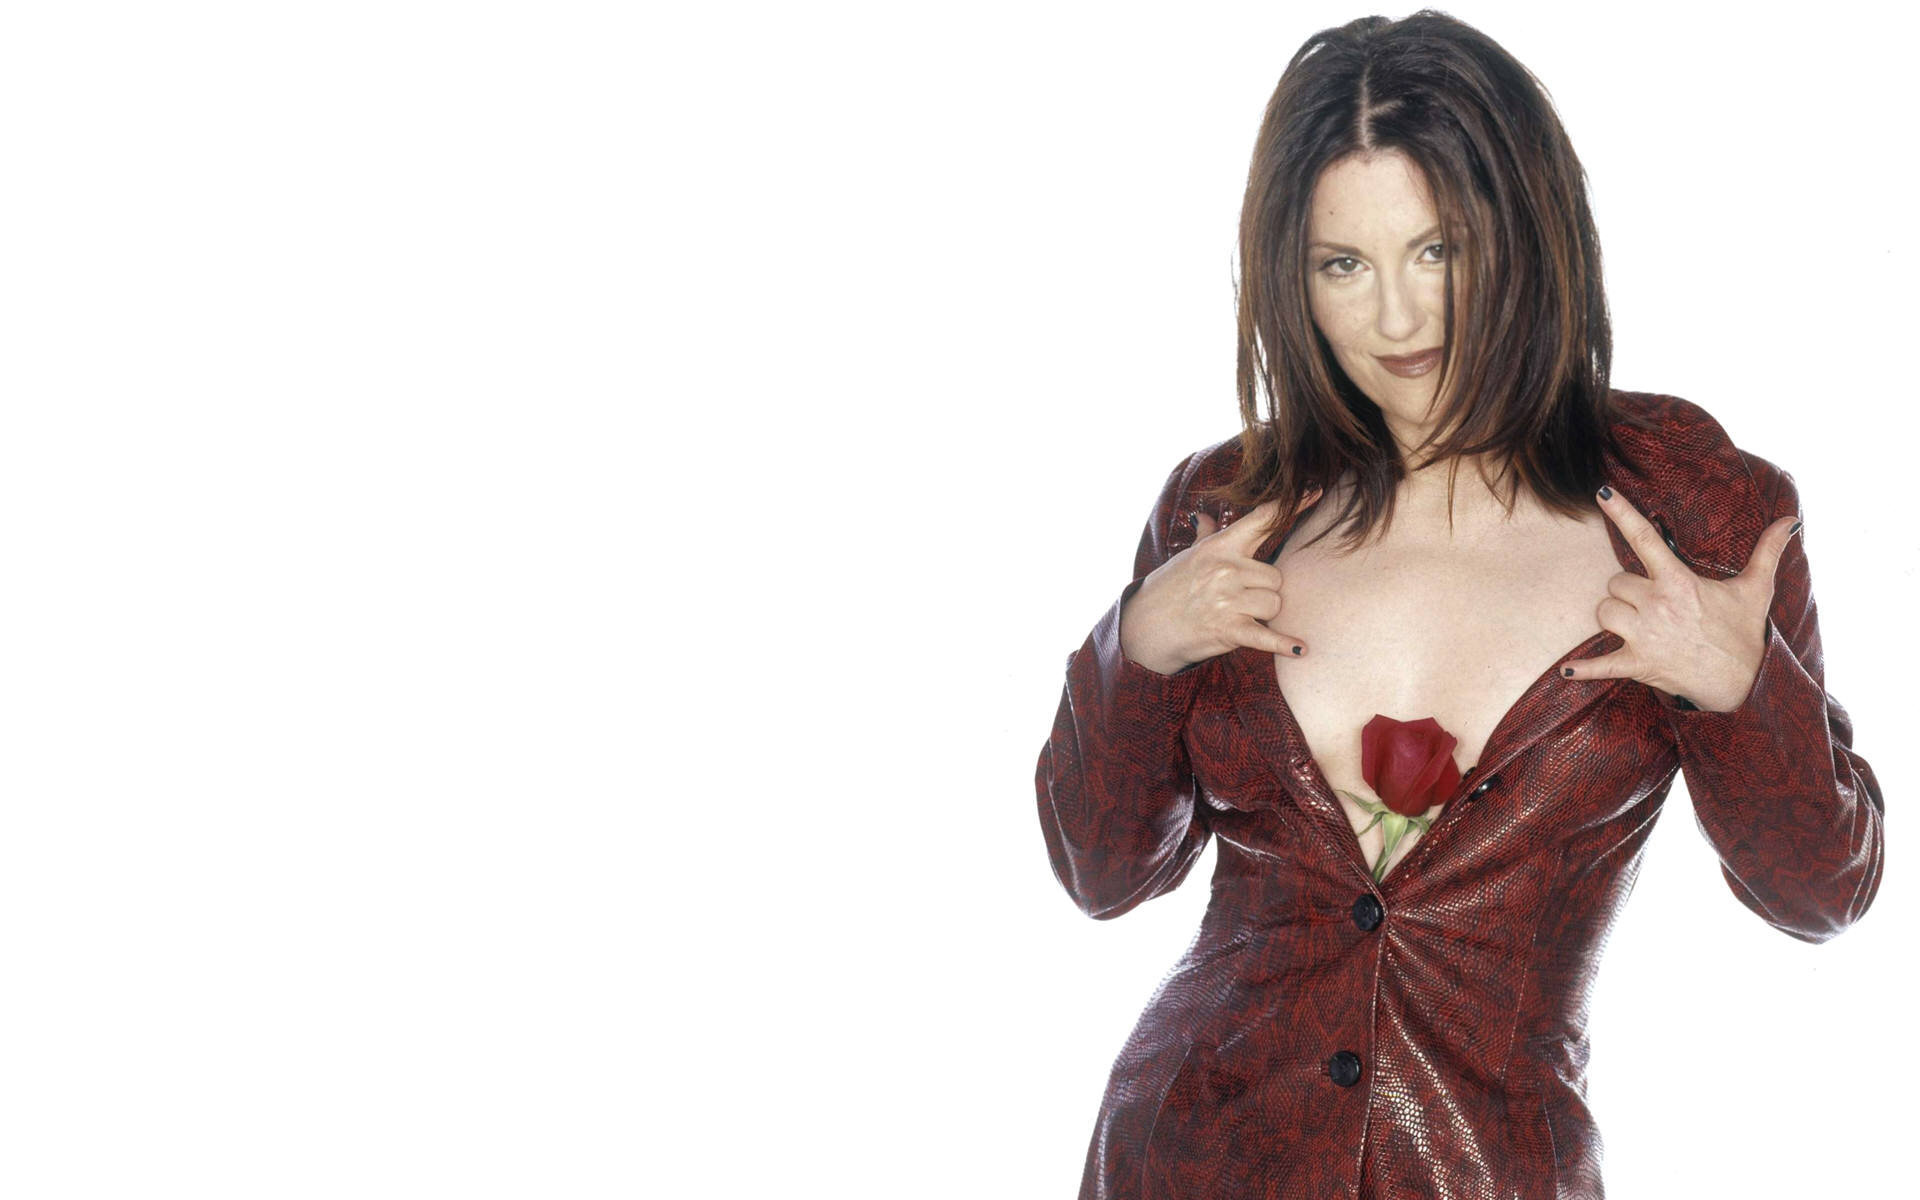 Megan mullally topless #12